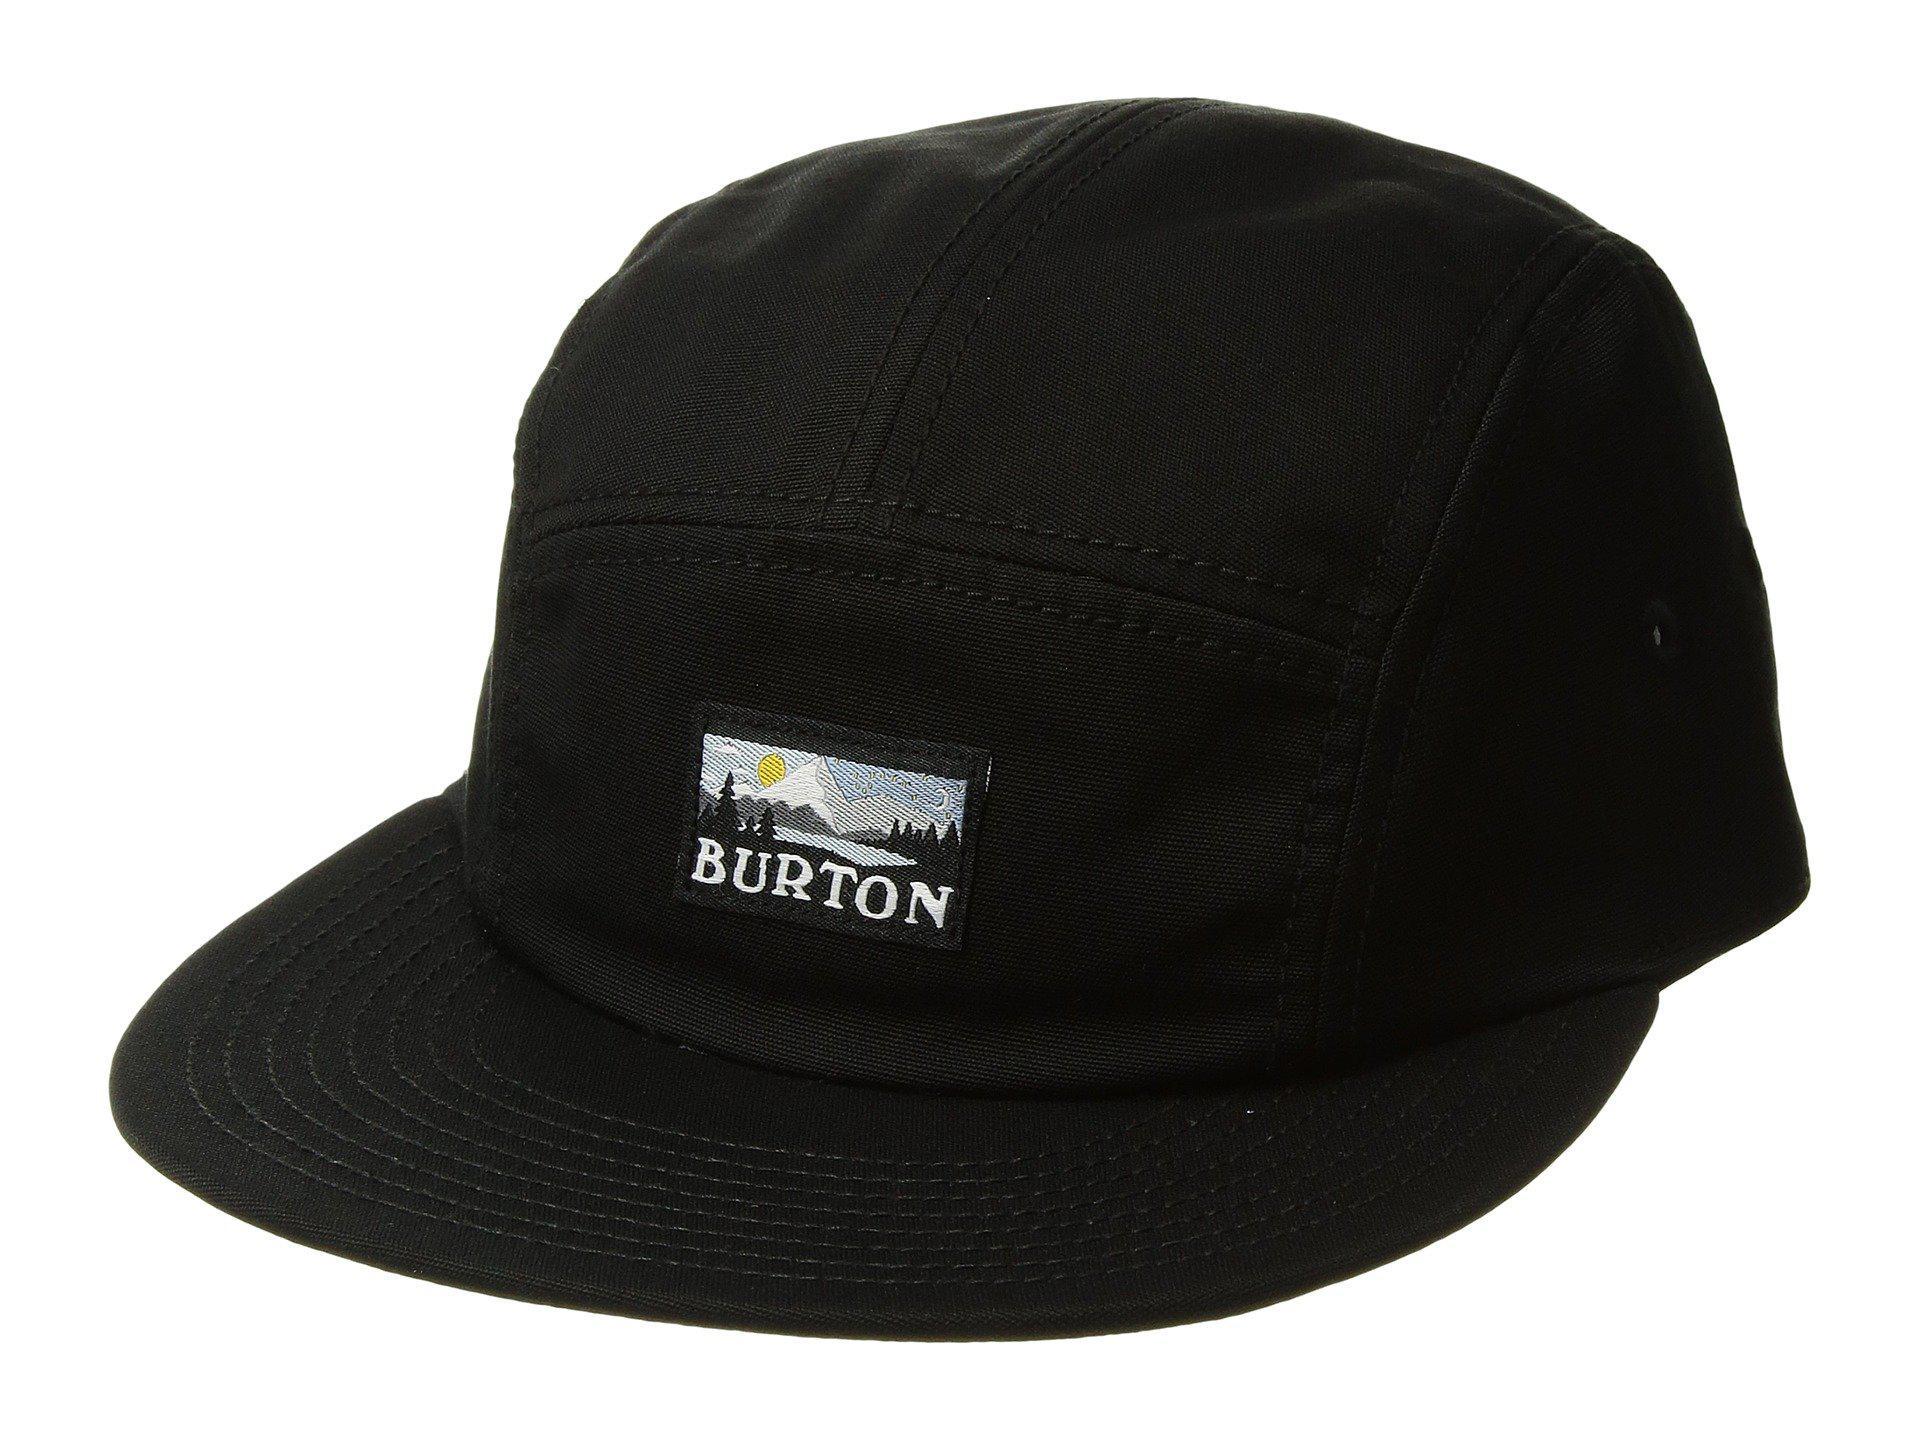 35edabdf6be Lyst - Burton Cordova 5 Panel Hat in Black for Men